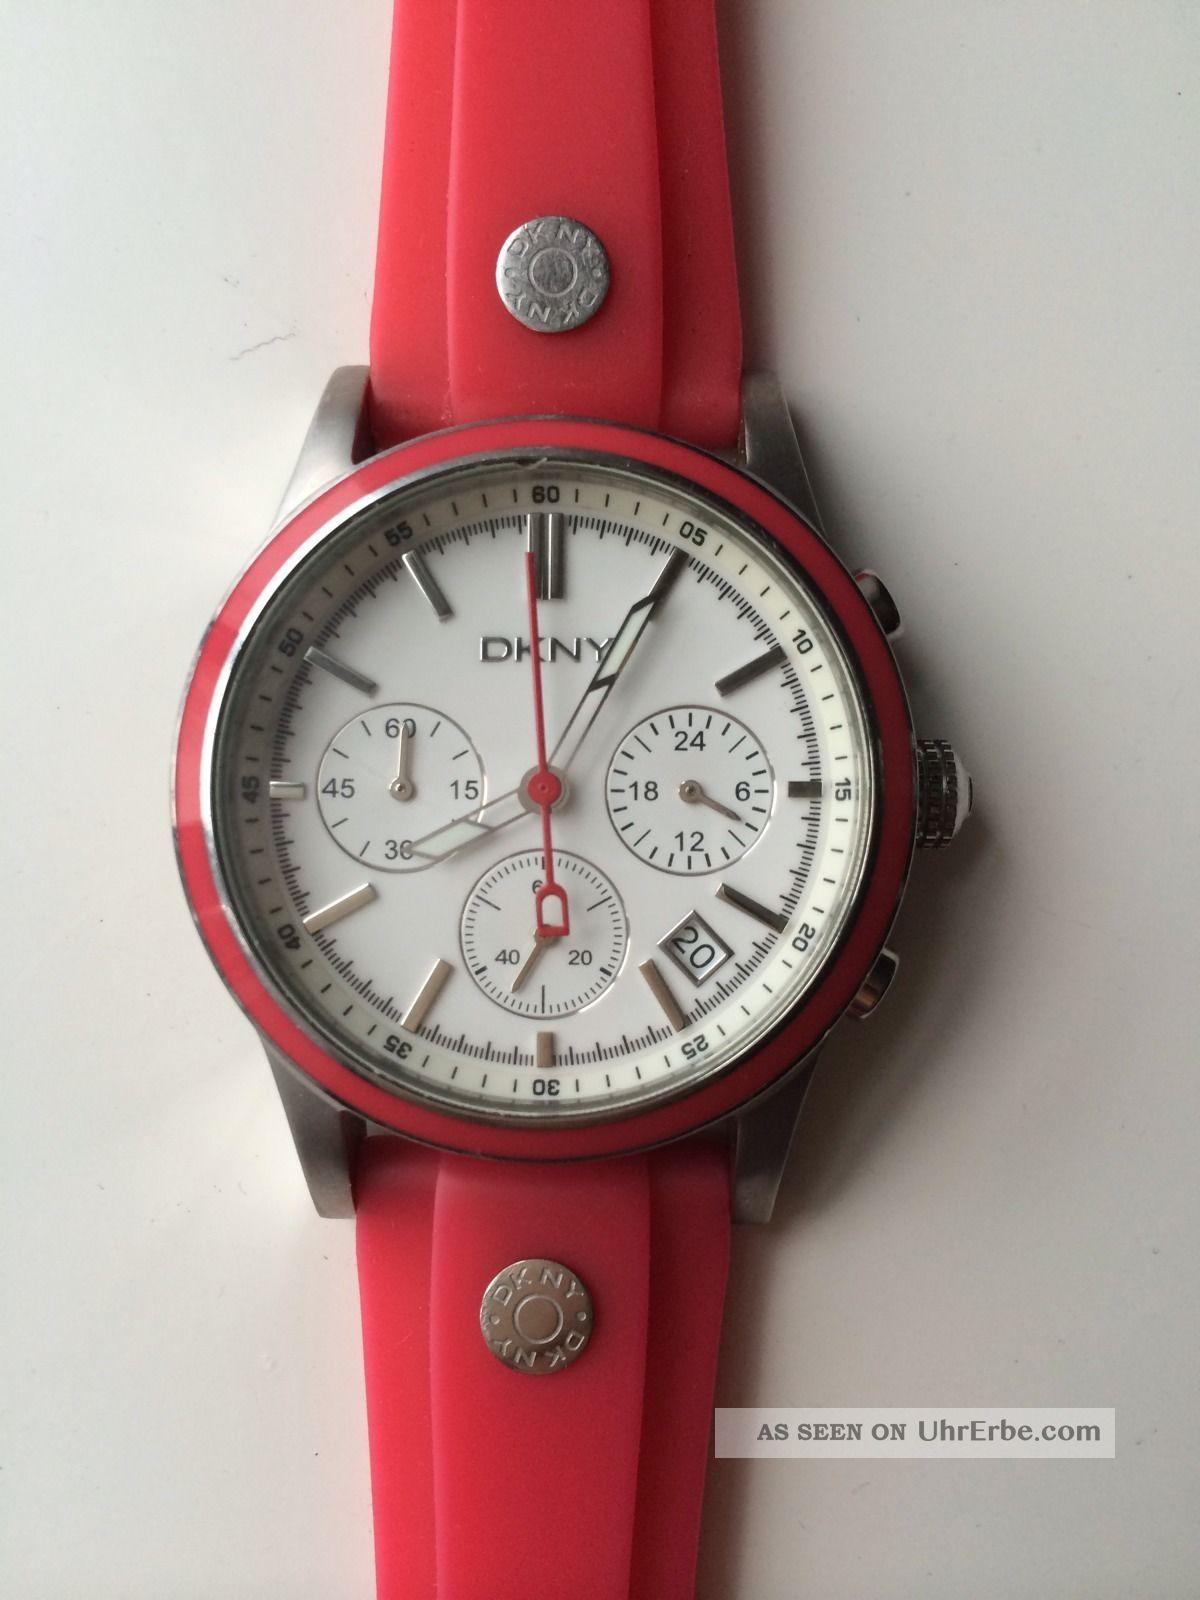 Dkny Uhr Rot Silikon - Xmas Armbanduhren Bild